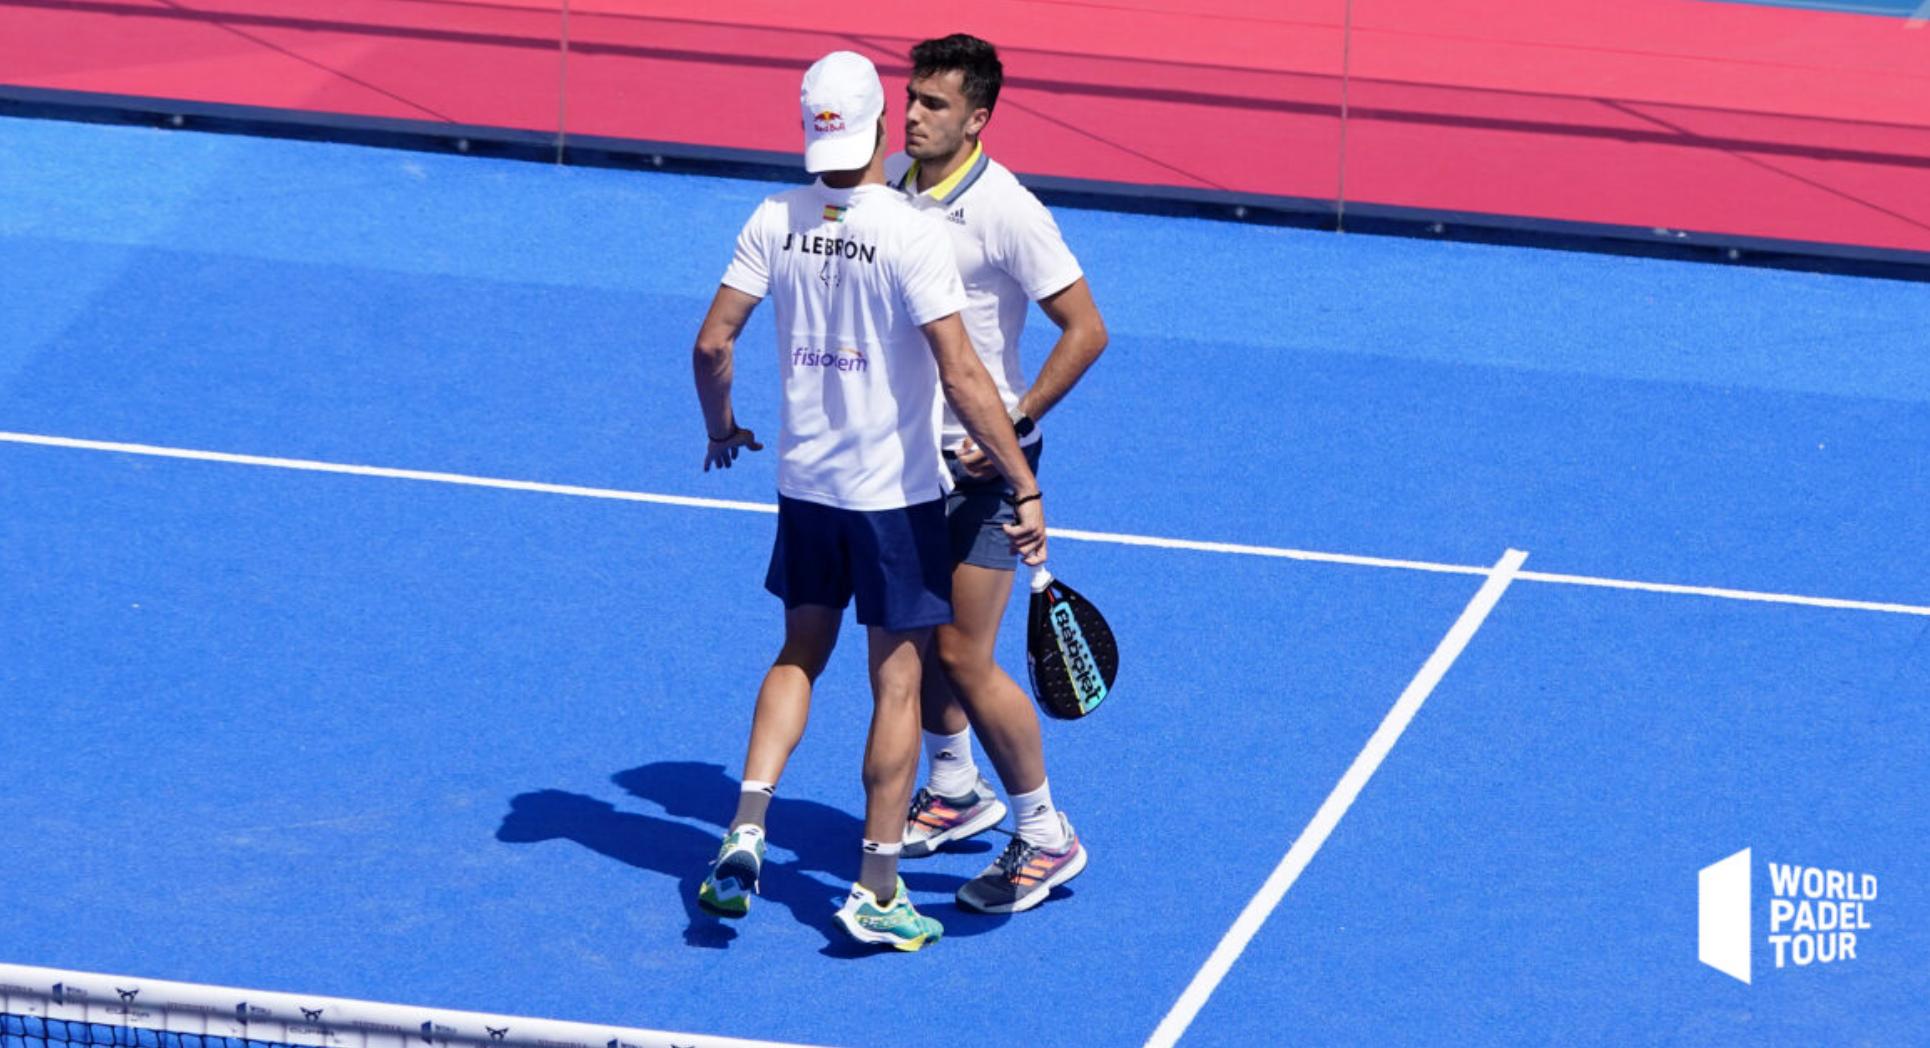 Juan Lebron et Ale Galan Vainqueur Marbella Master 2021